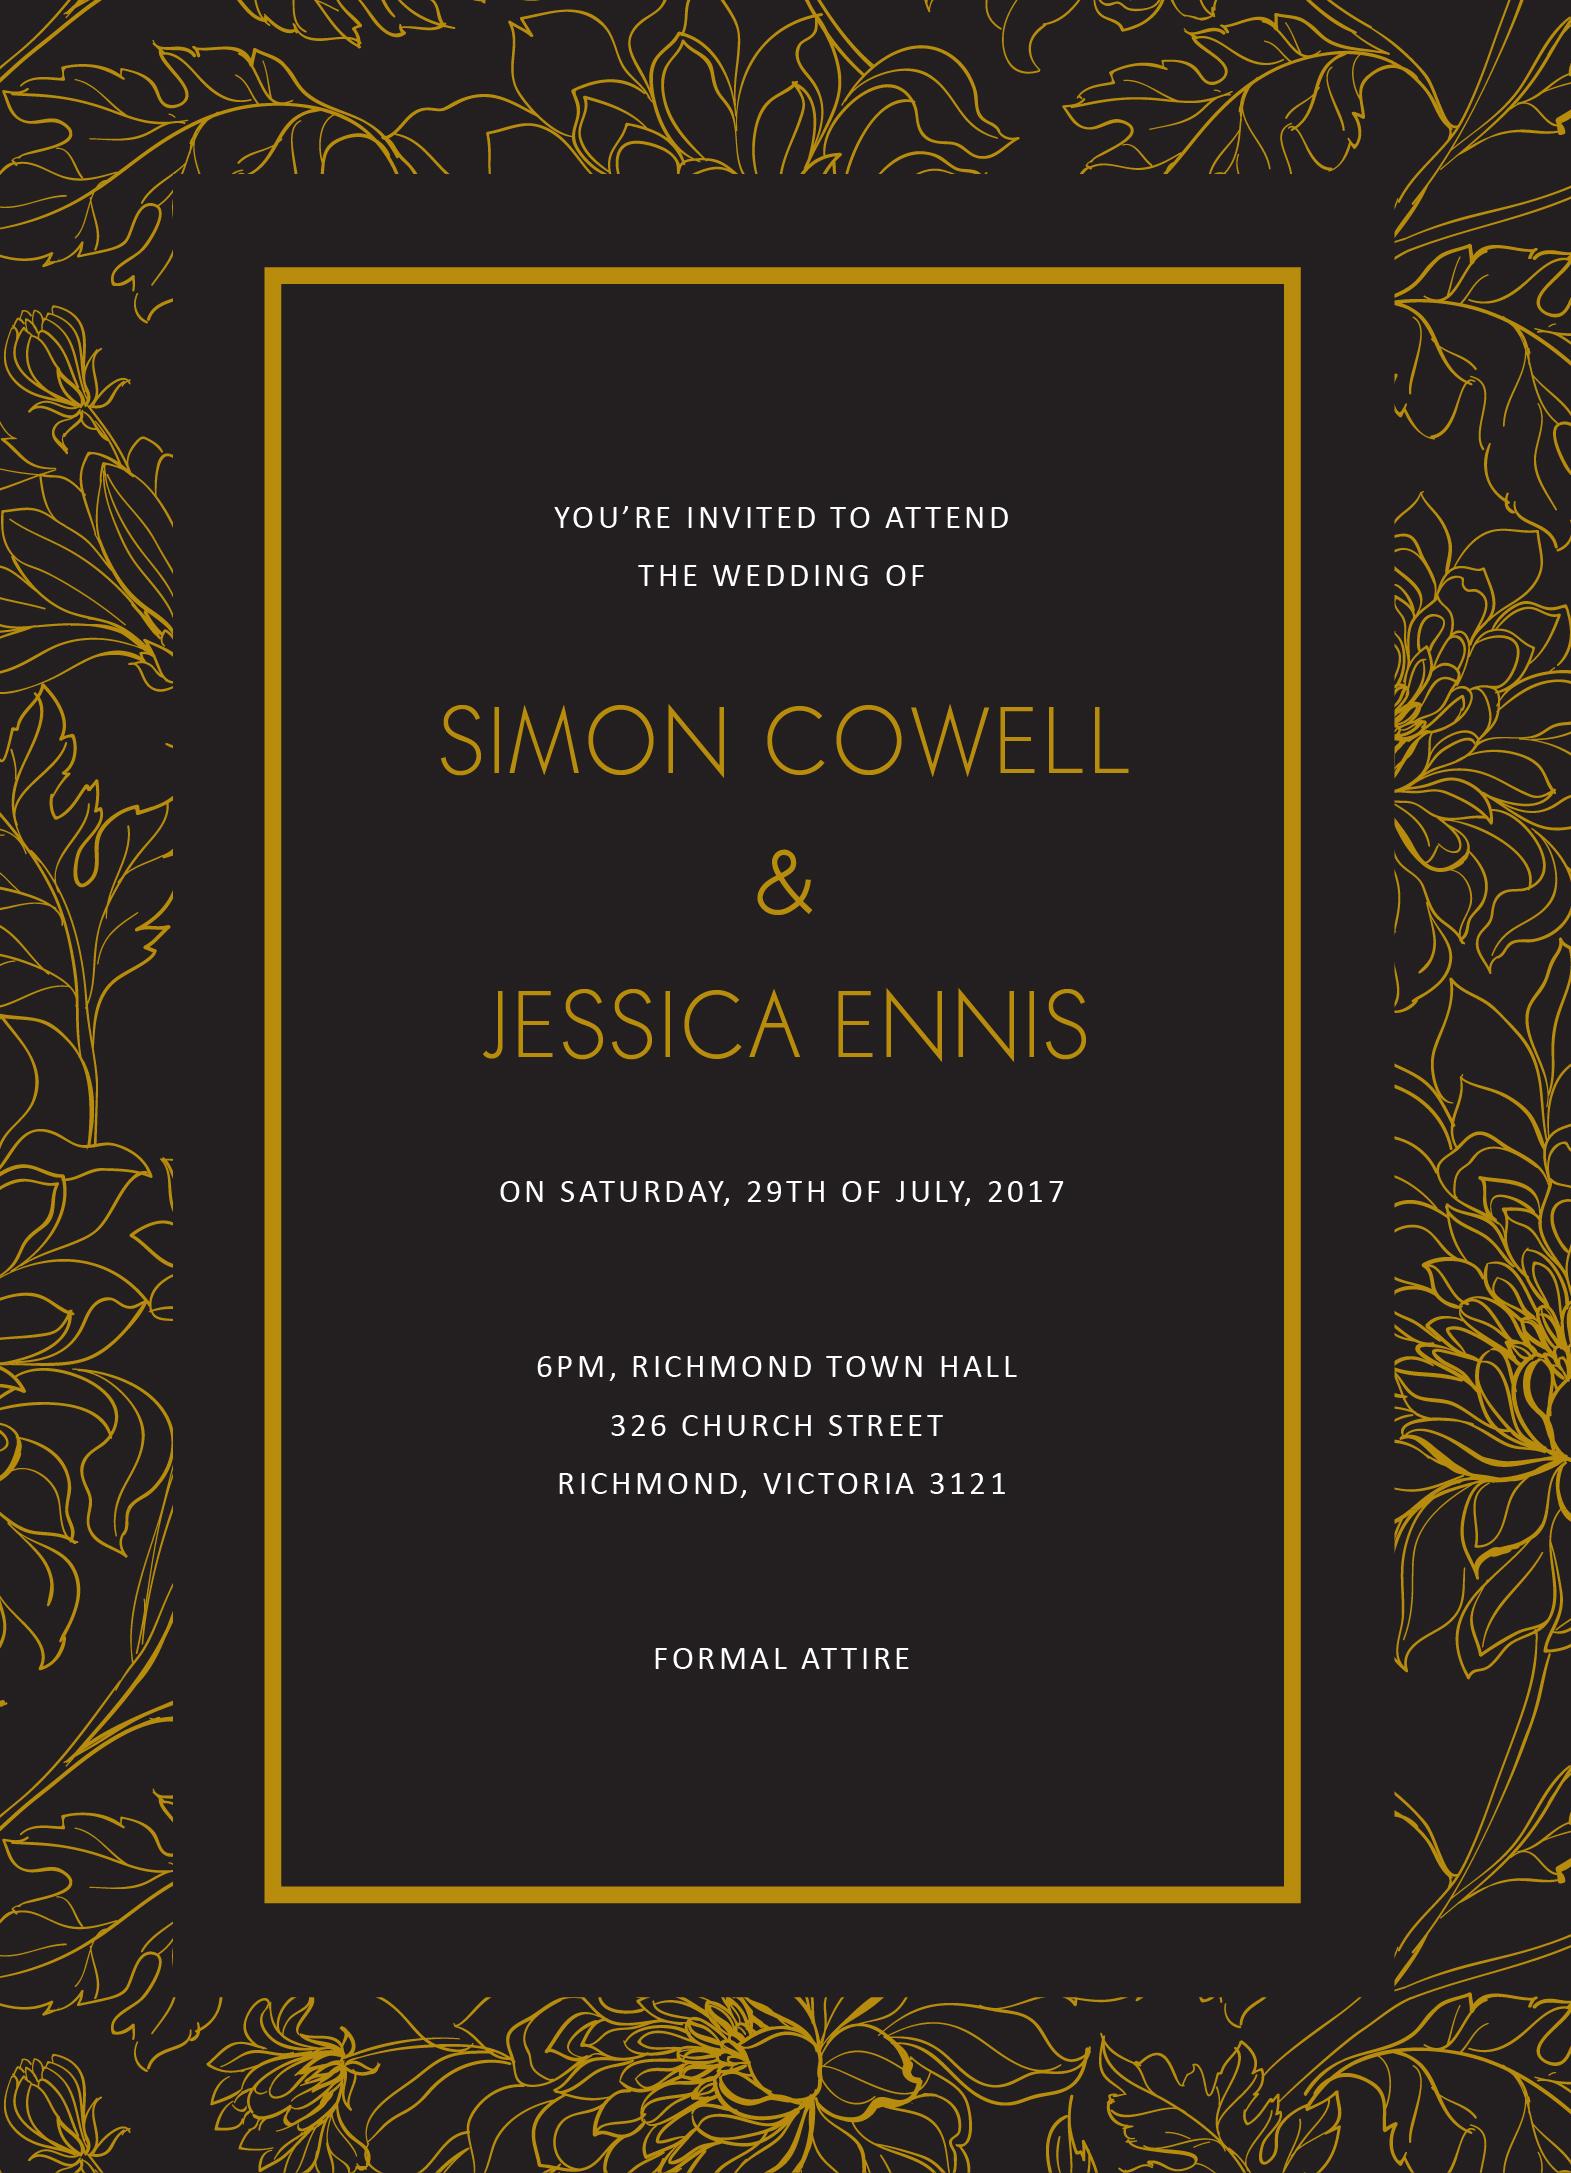 Gold Flower Illustration - Wedding Invitations